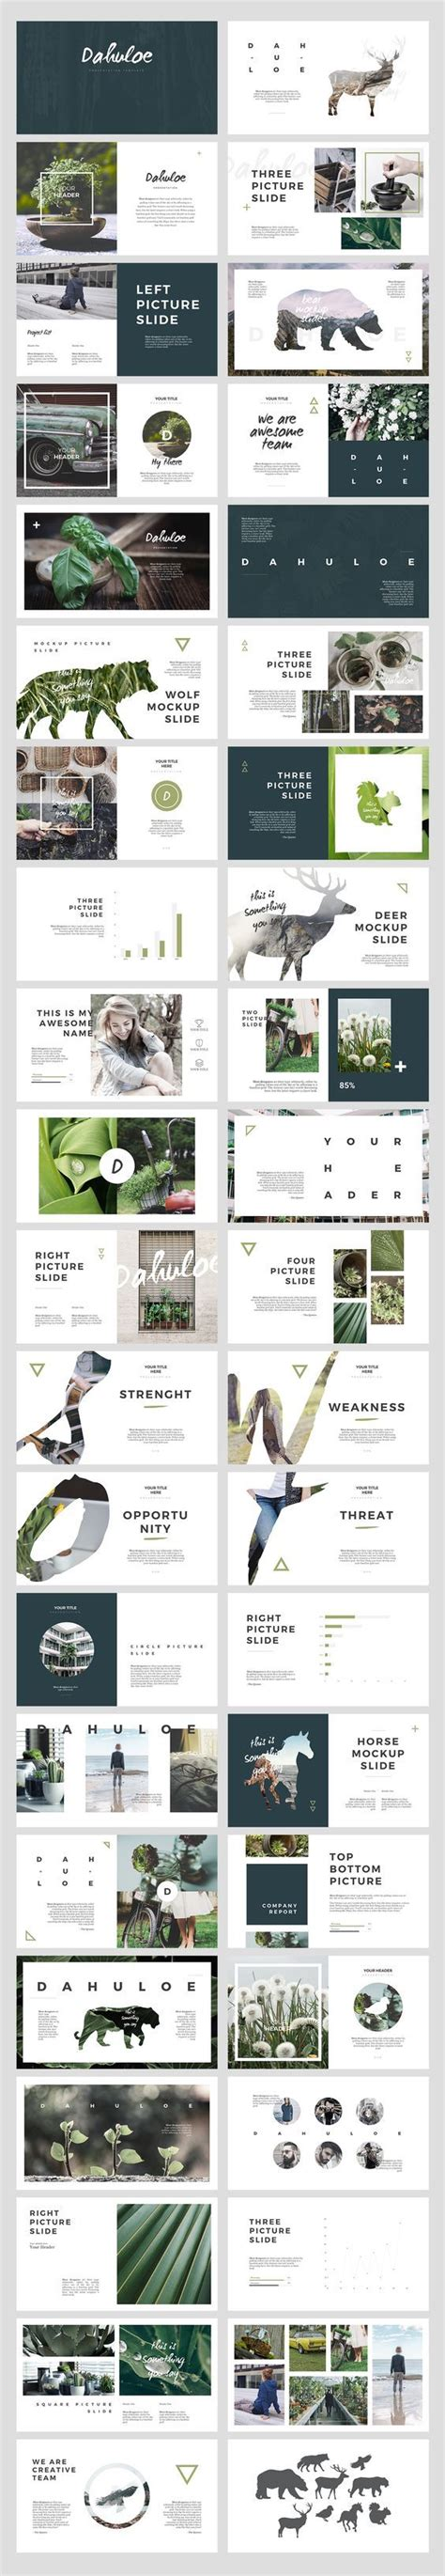 layout presentation indesign 3740 best images about dtp editorial design on pinterest